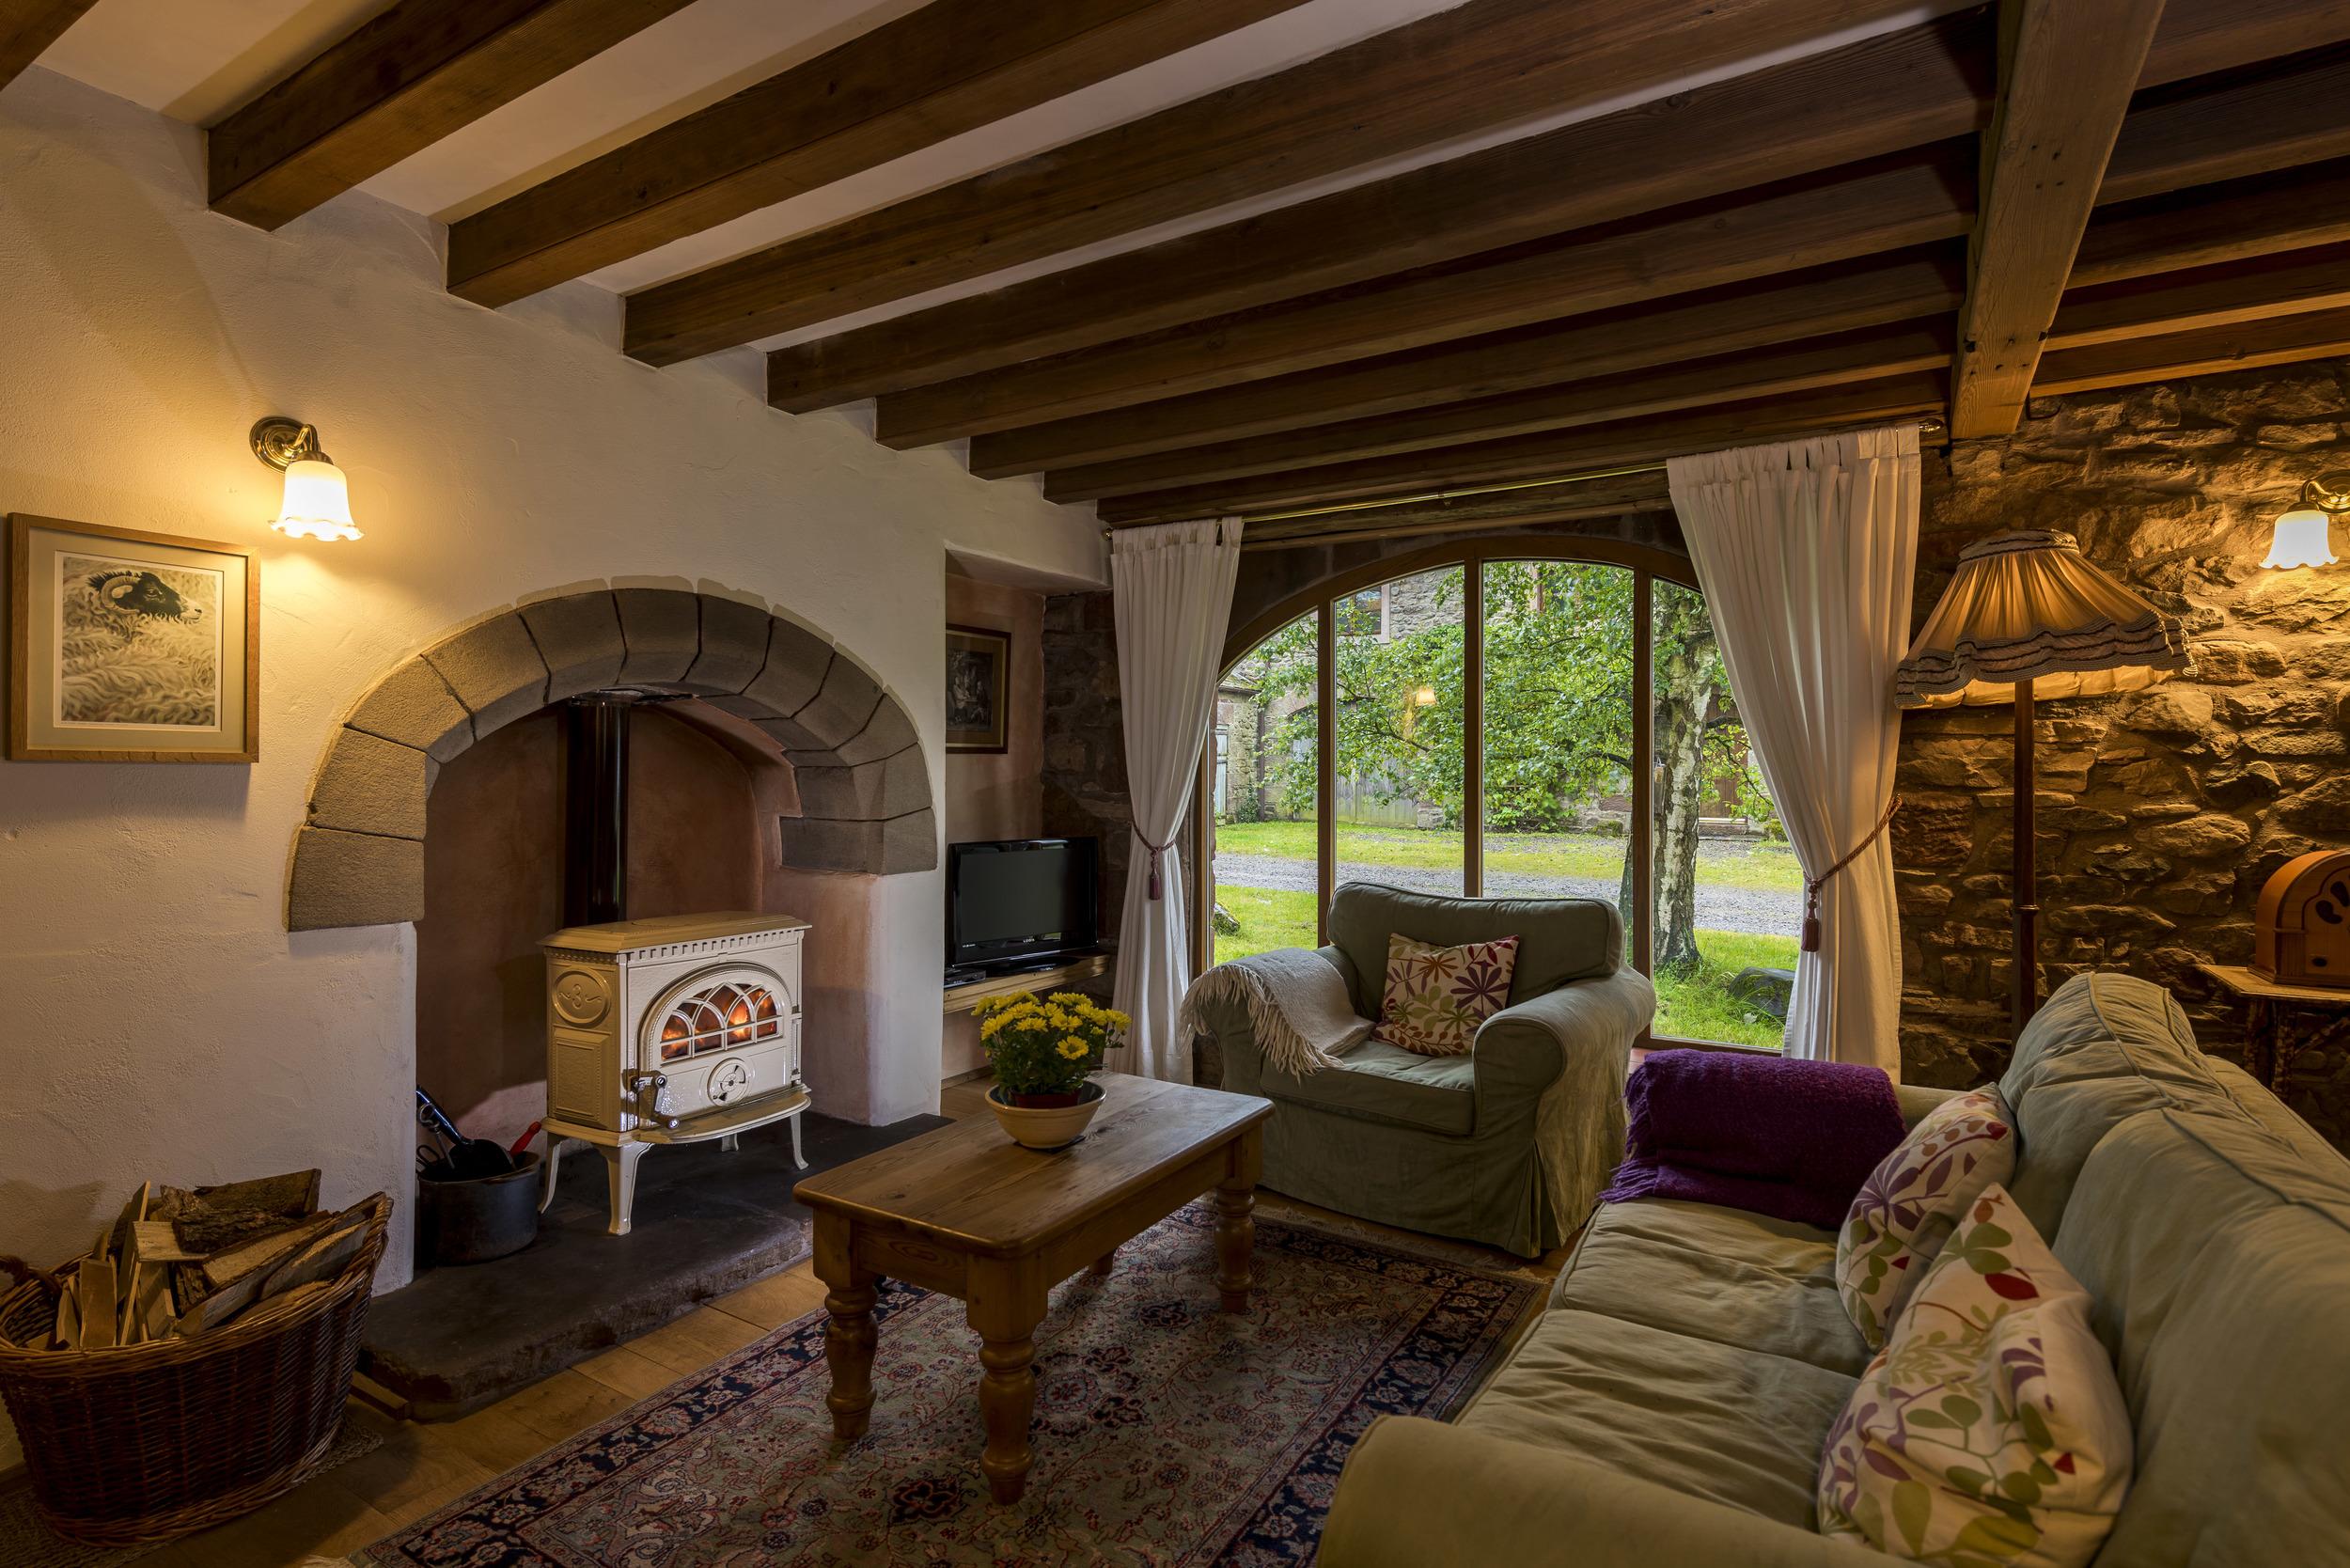 Kirkland_Hall_Cottages-56.jpg